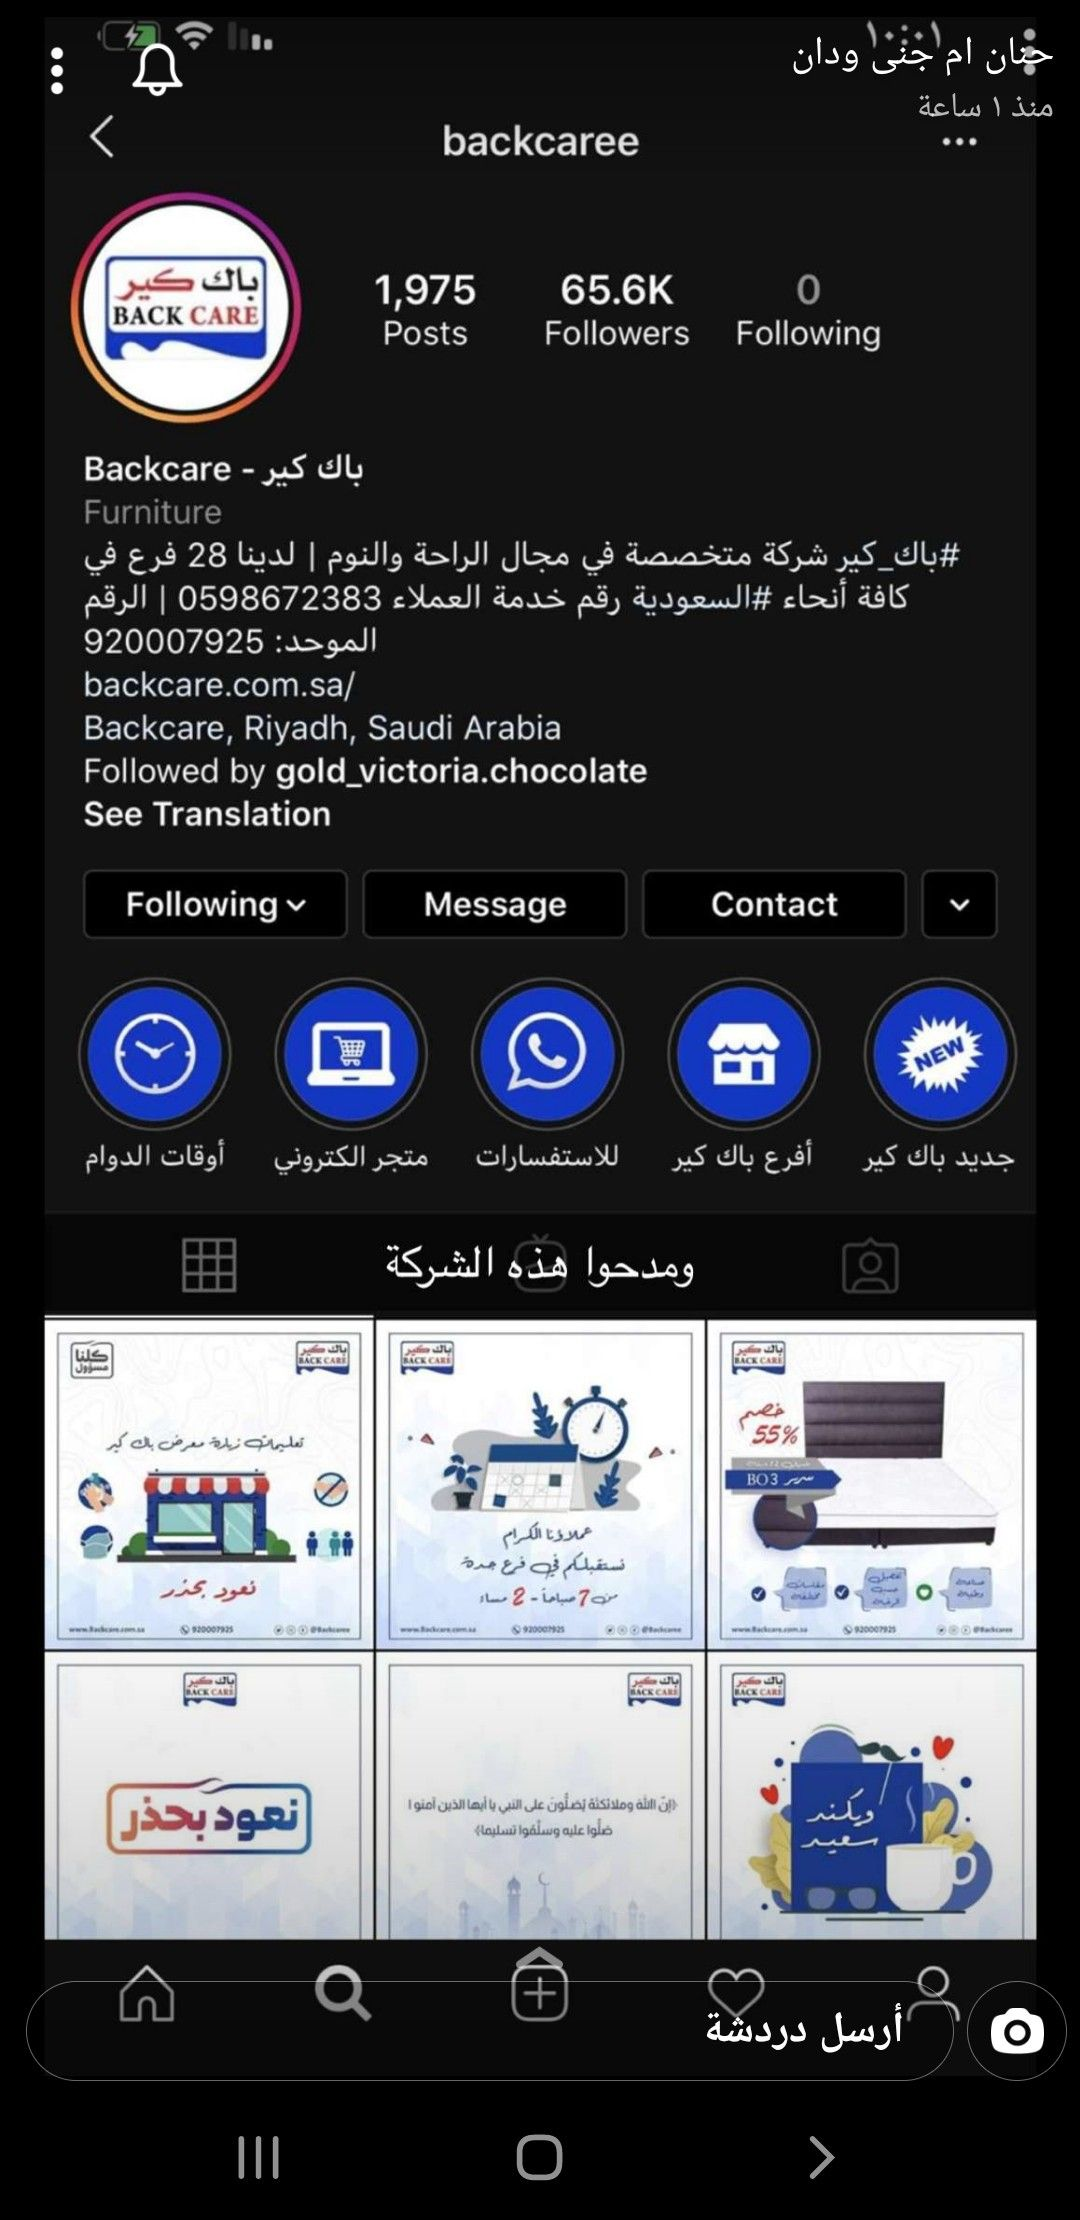 Pin By Shahd On التعامل مع مواقع التسوق Back Care Messages Riyadh